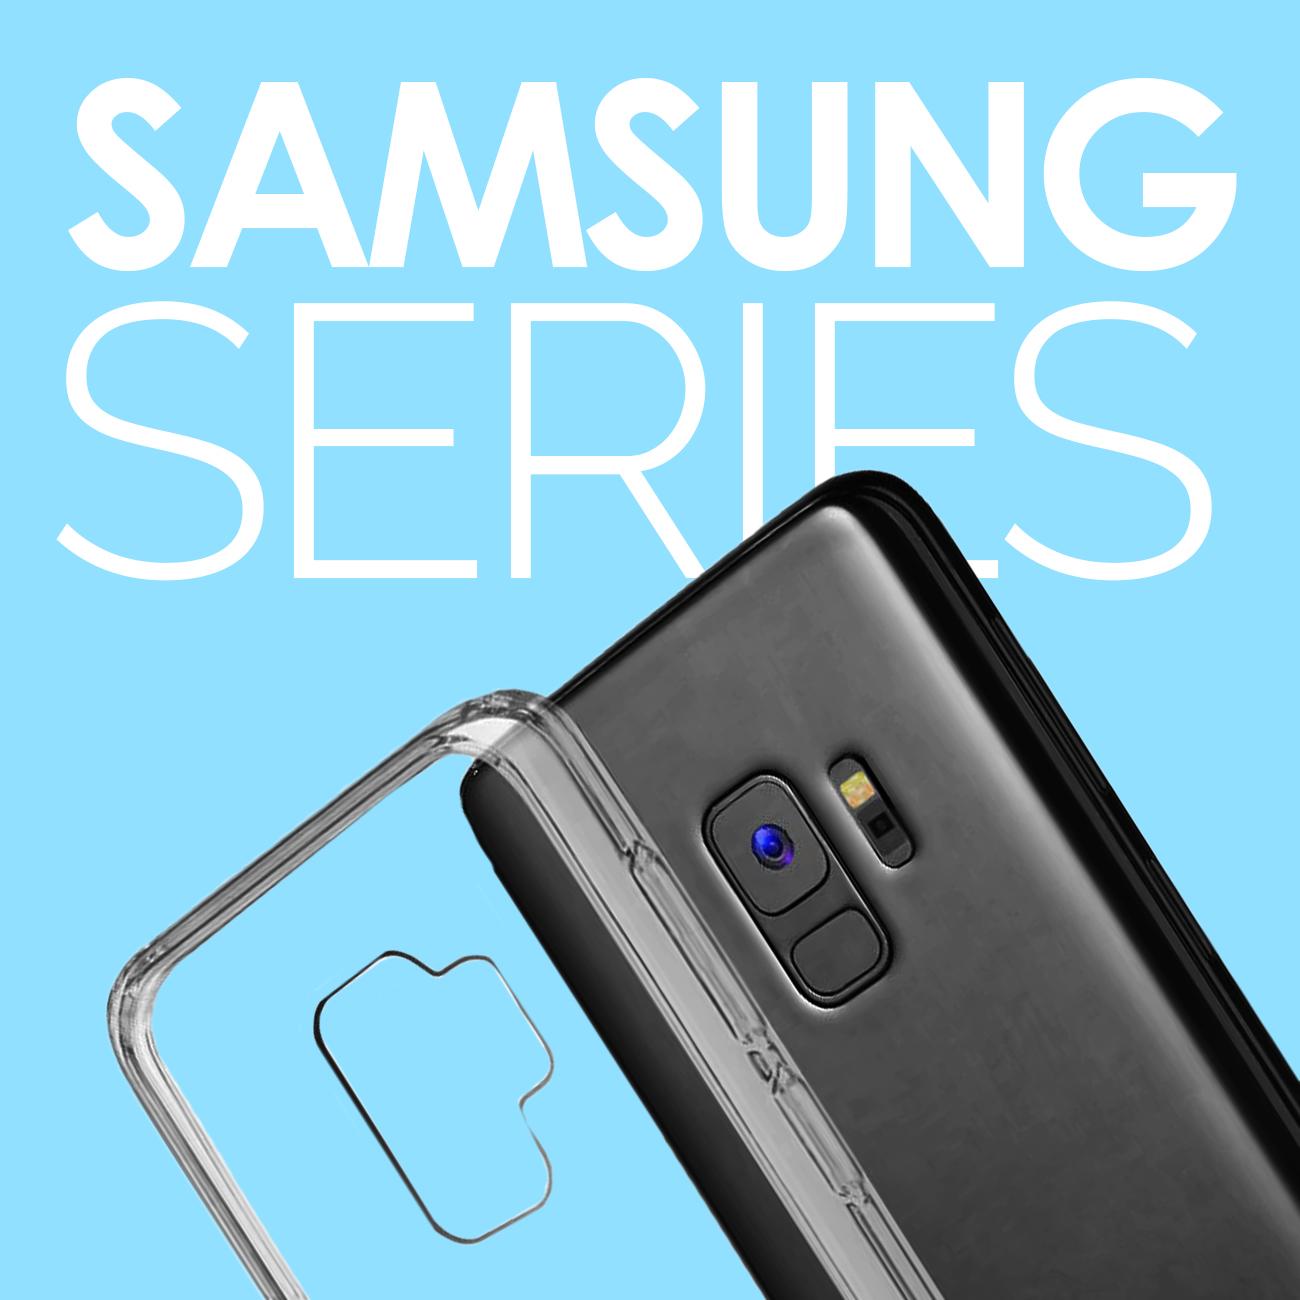 Samsung Series.jpg